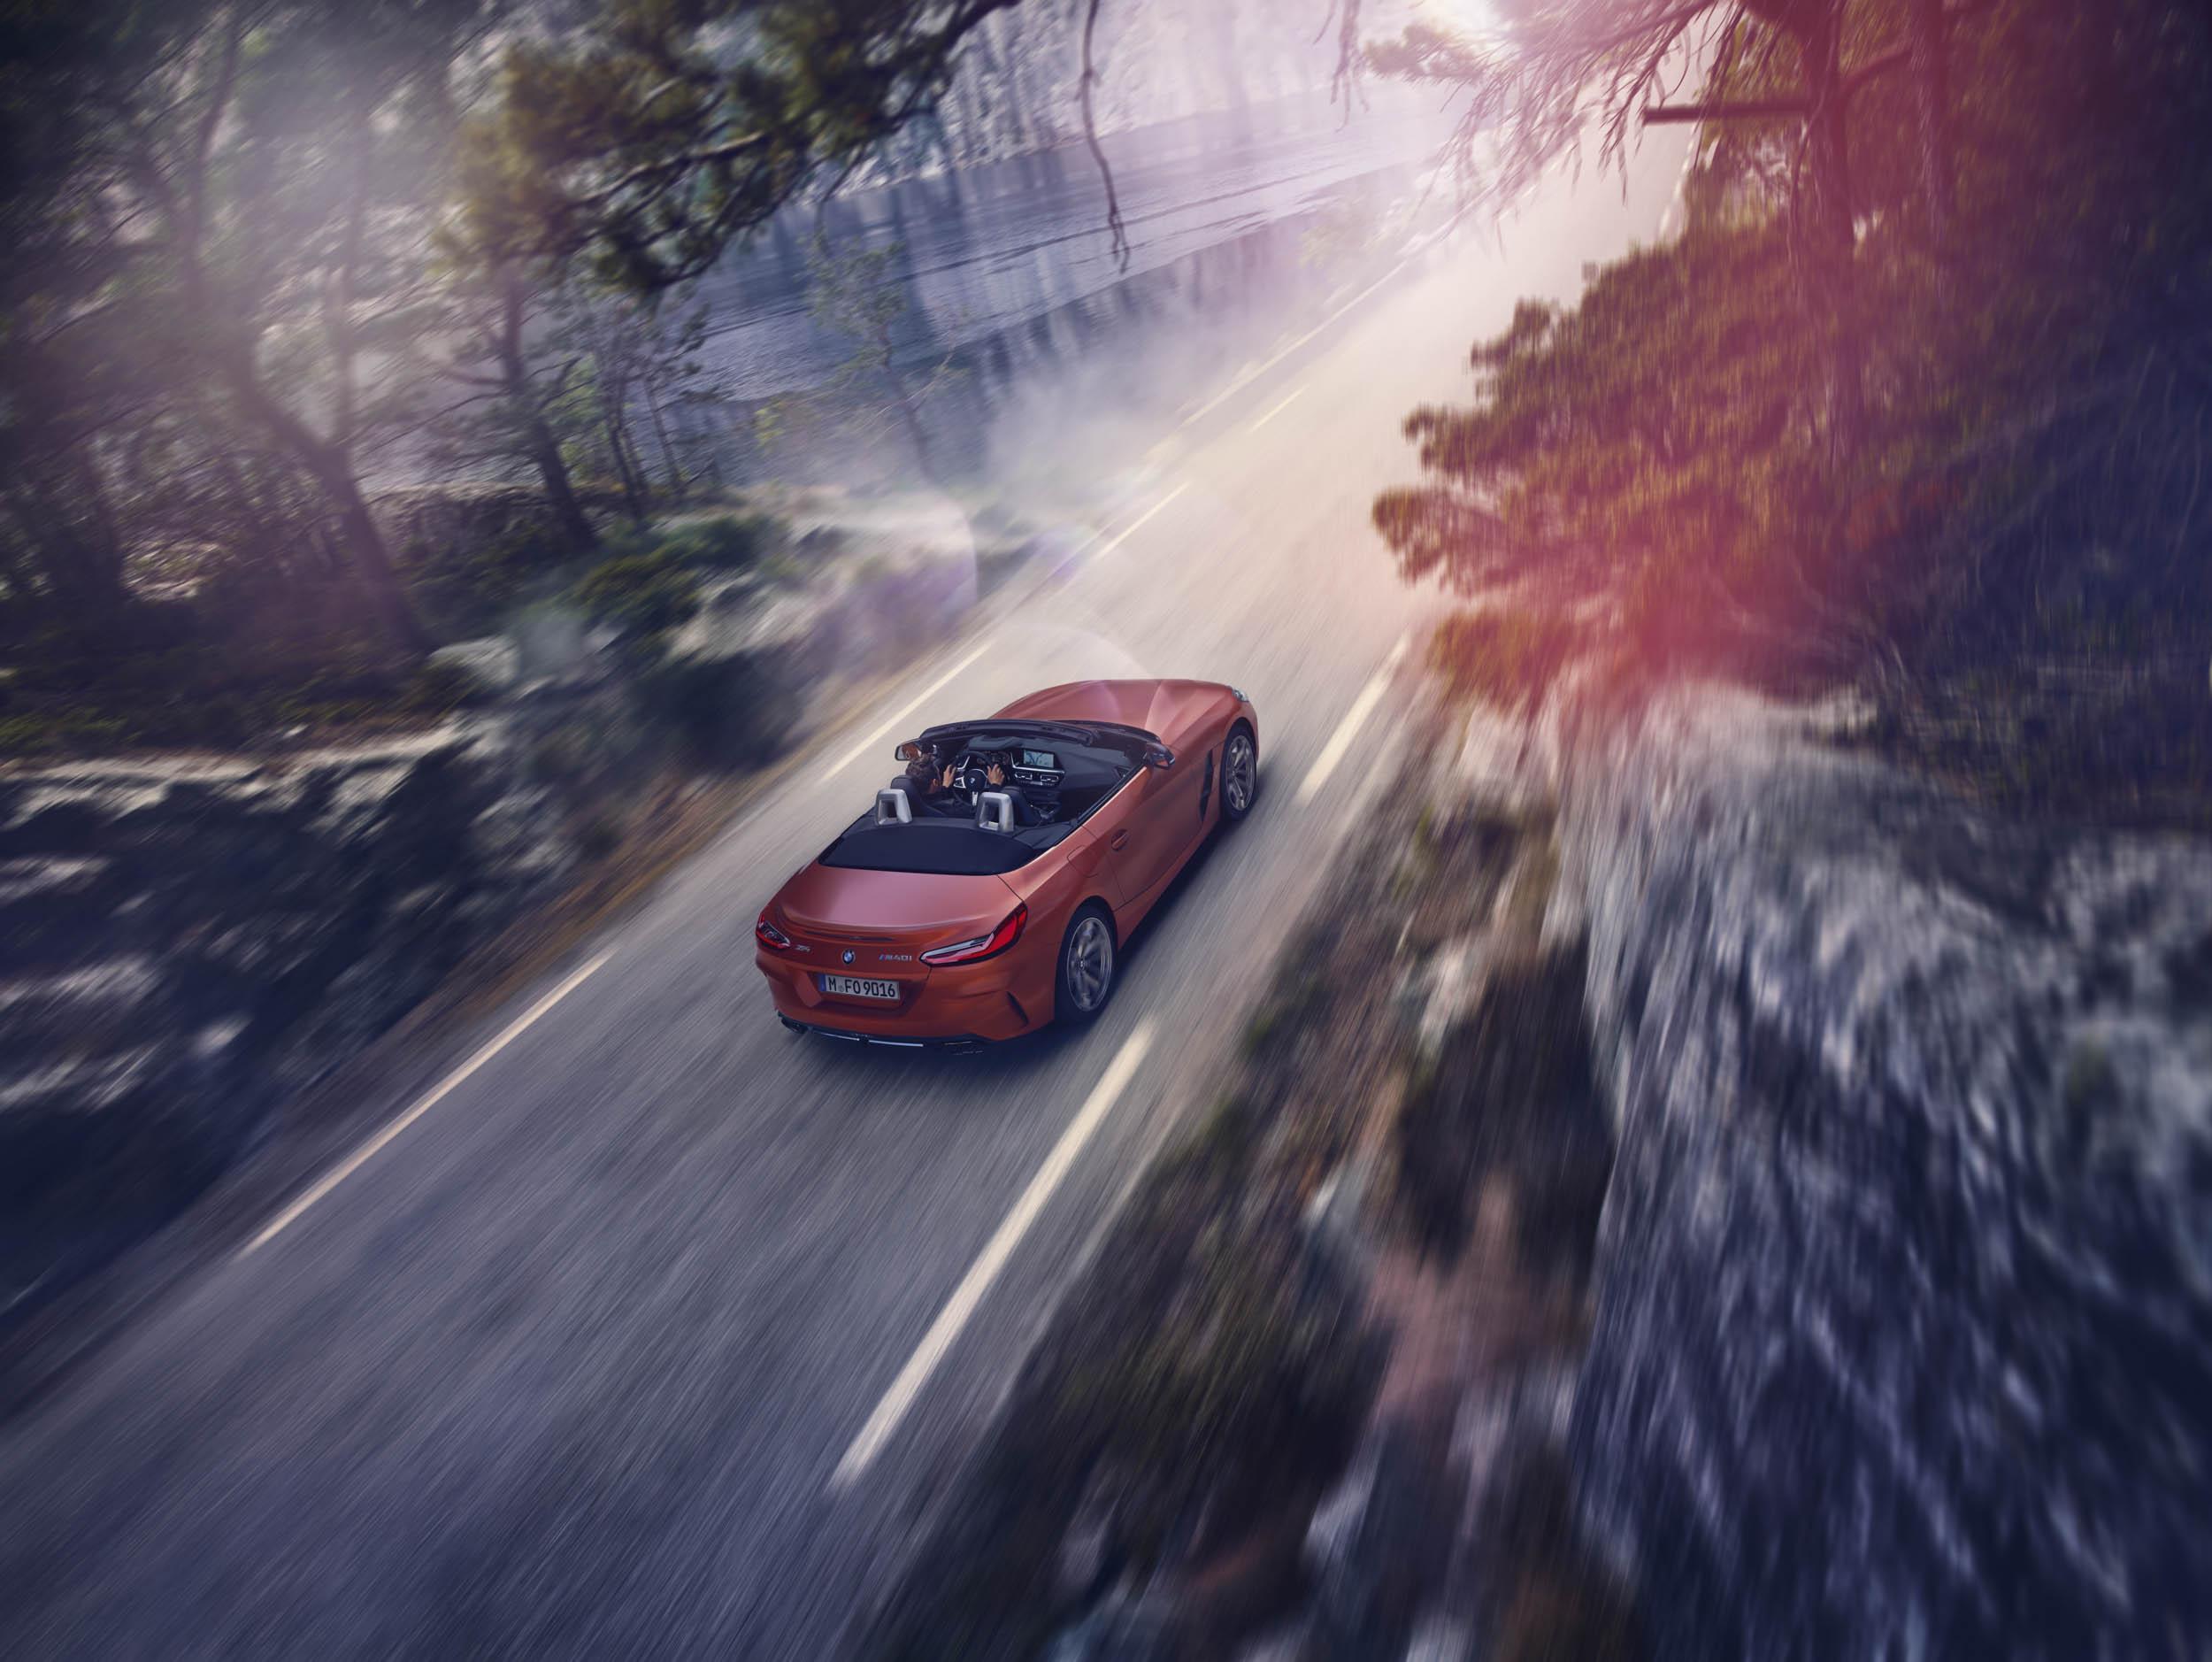 BMW Z4 driving